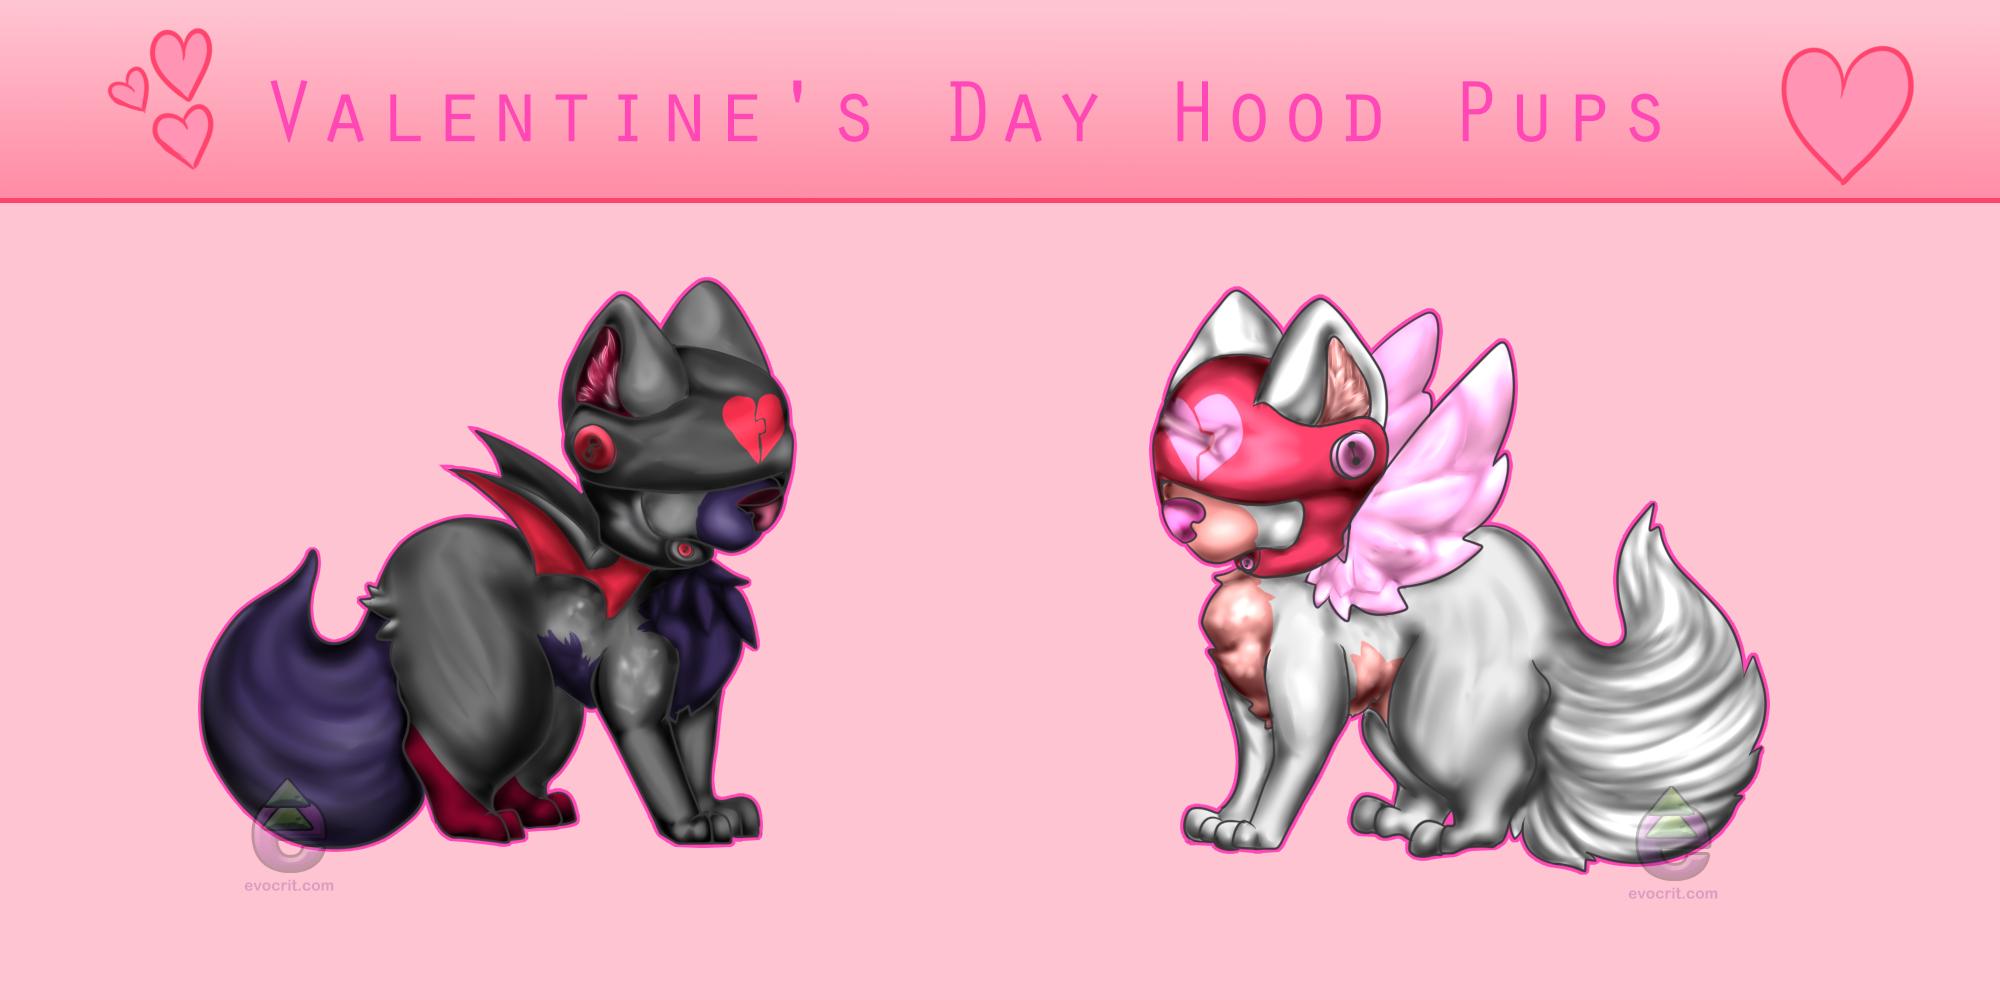 [OTA] Valentine's Day Hood Pups (2/2 OPEN)